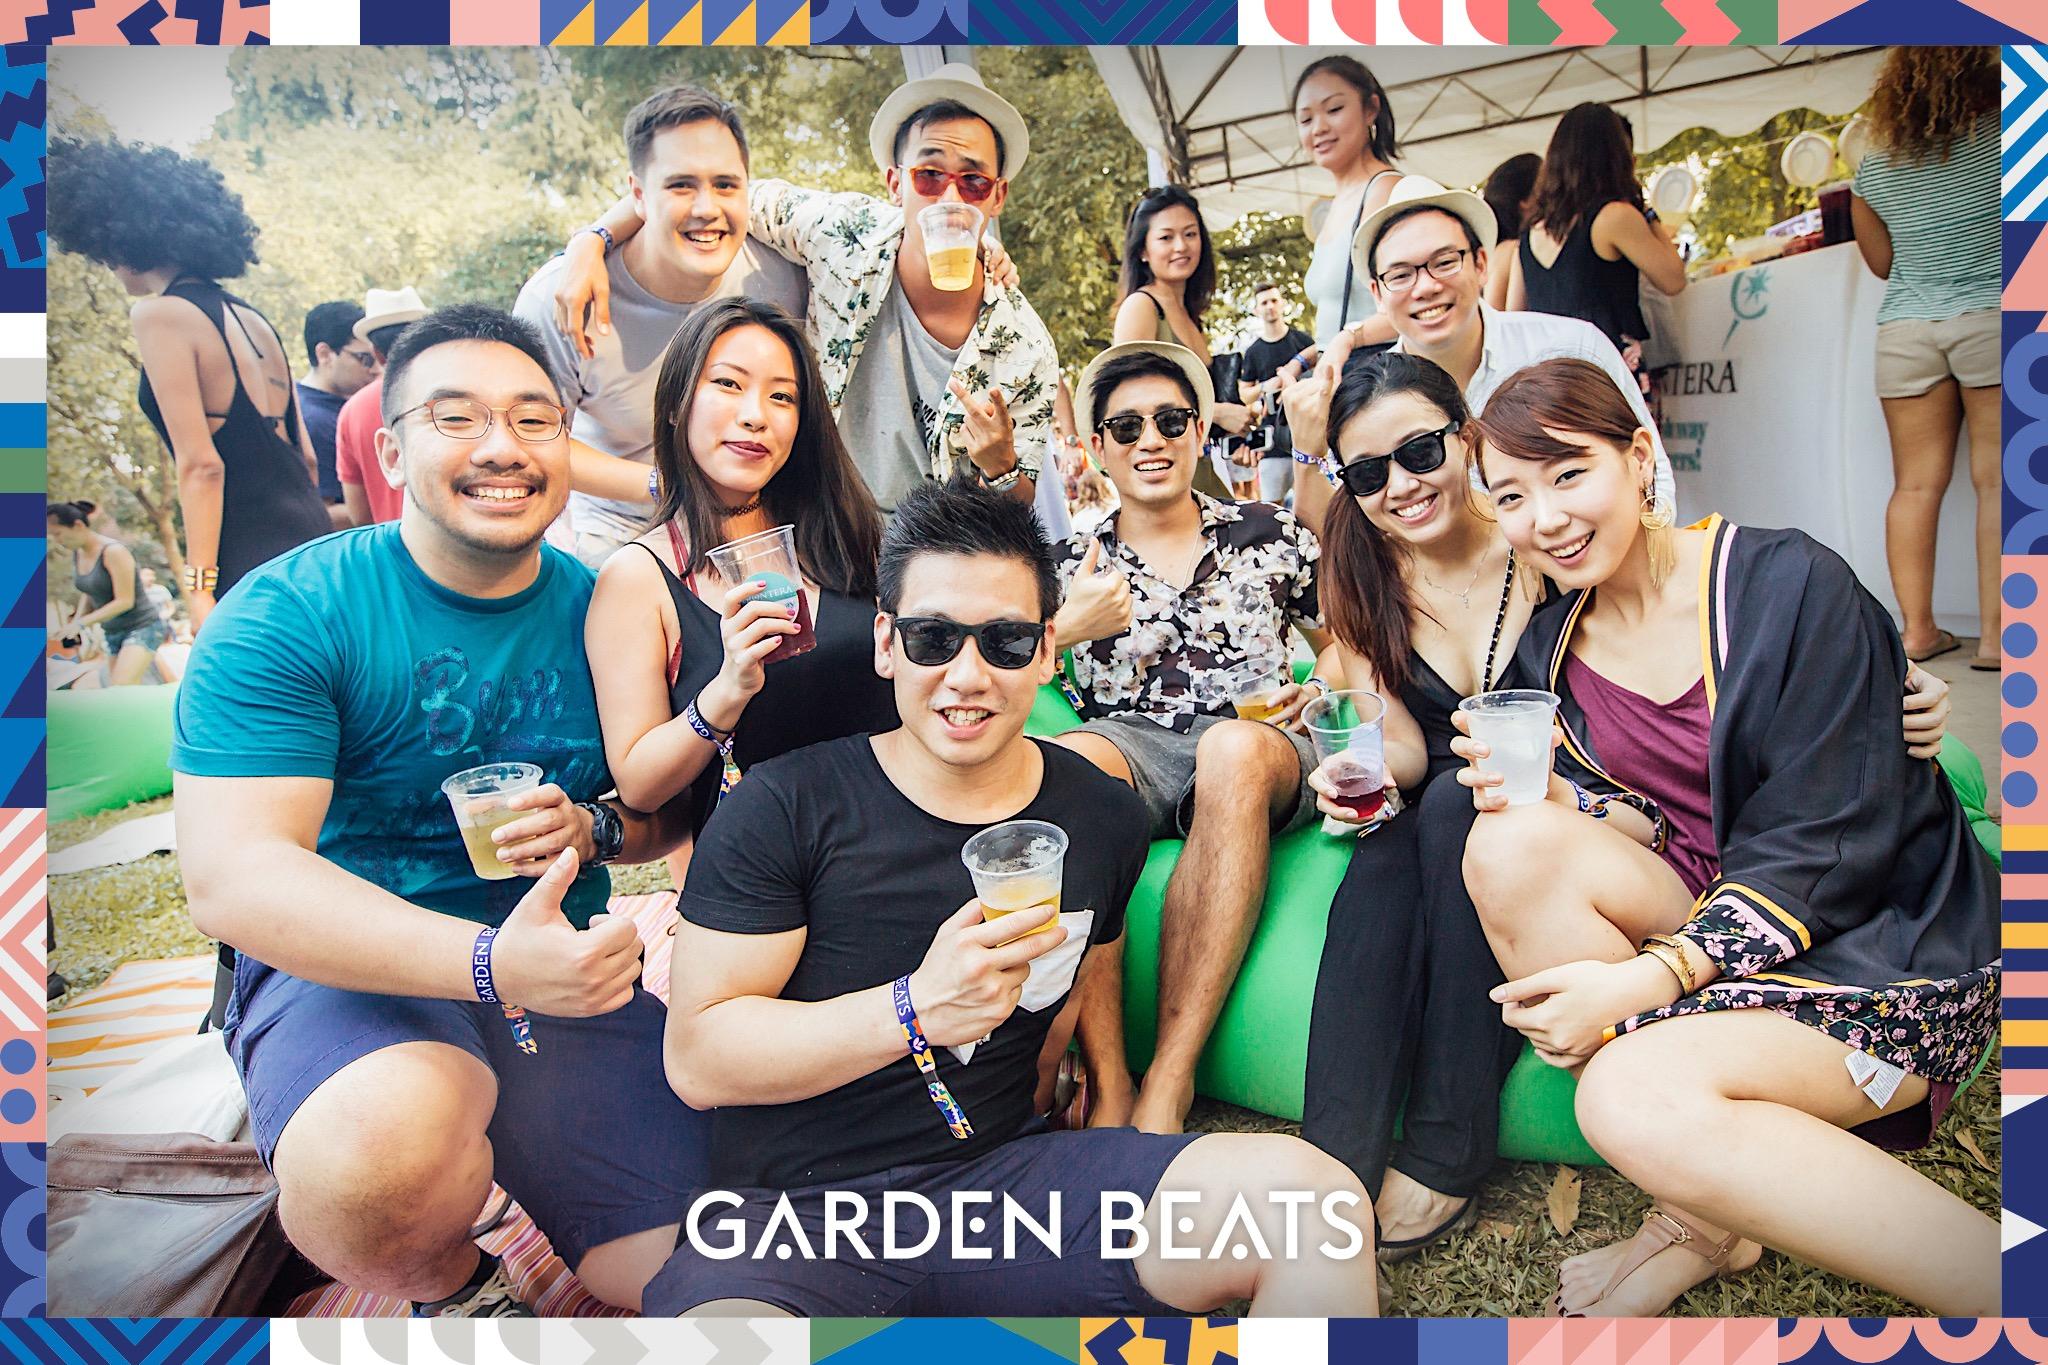 18032017_GardenBeats_Colossal544_WatermarkedGB.jpg